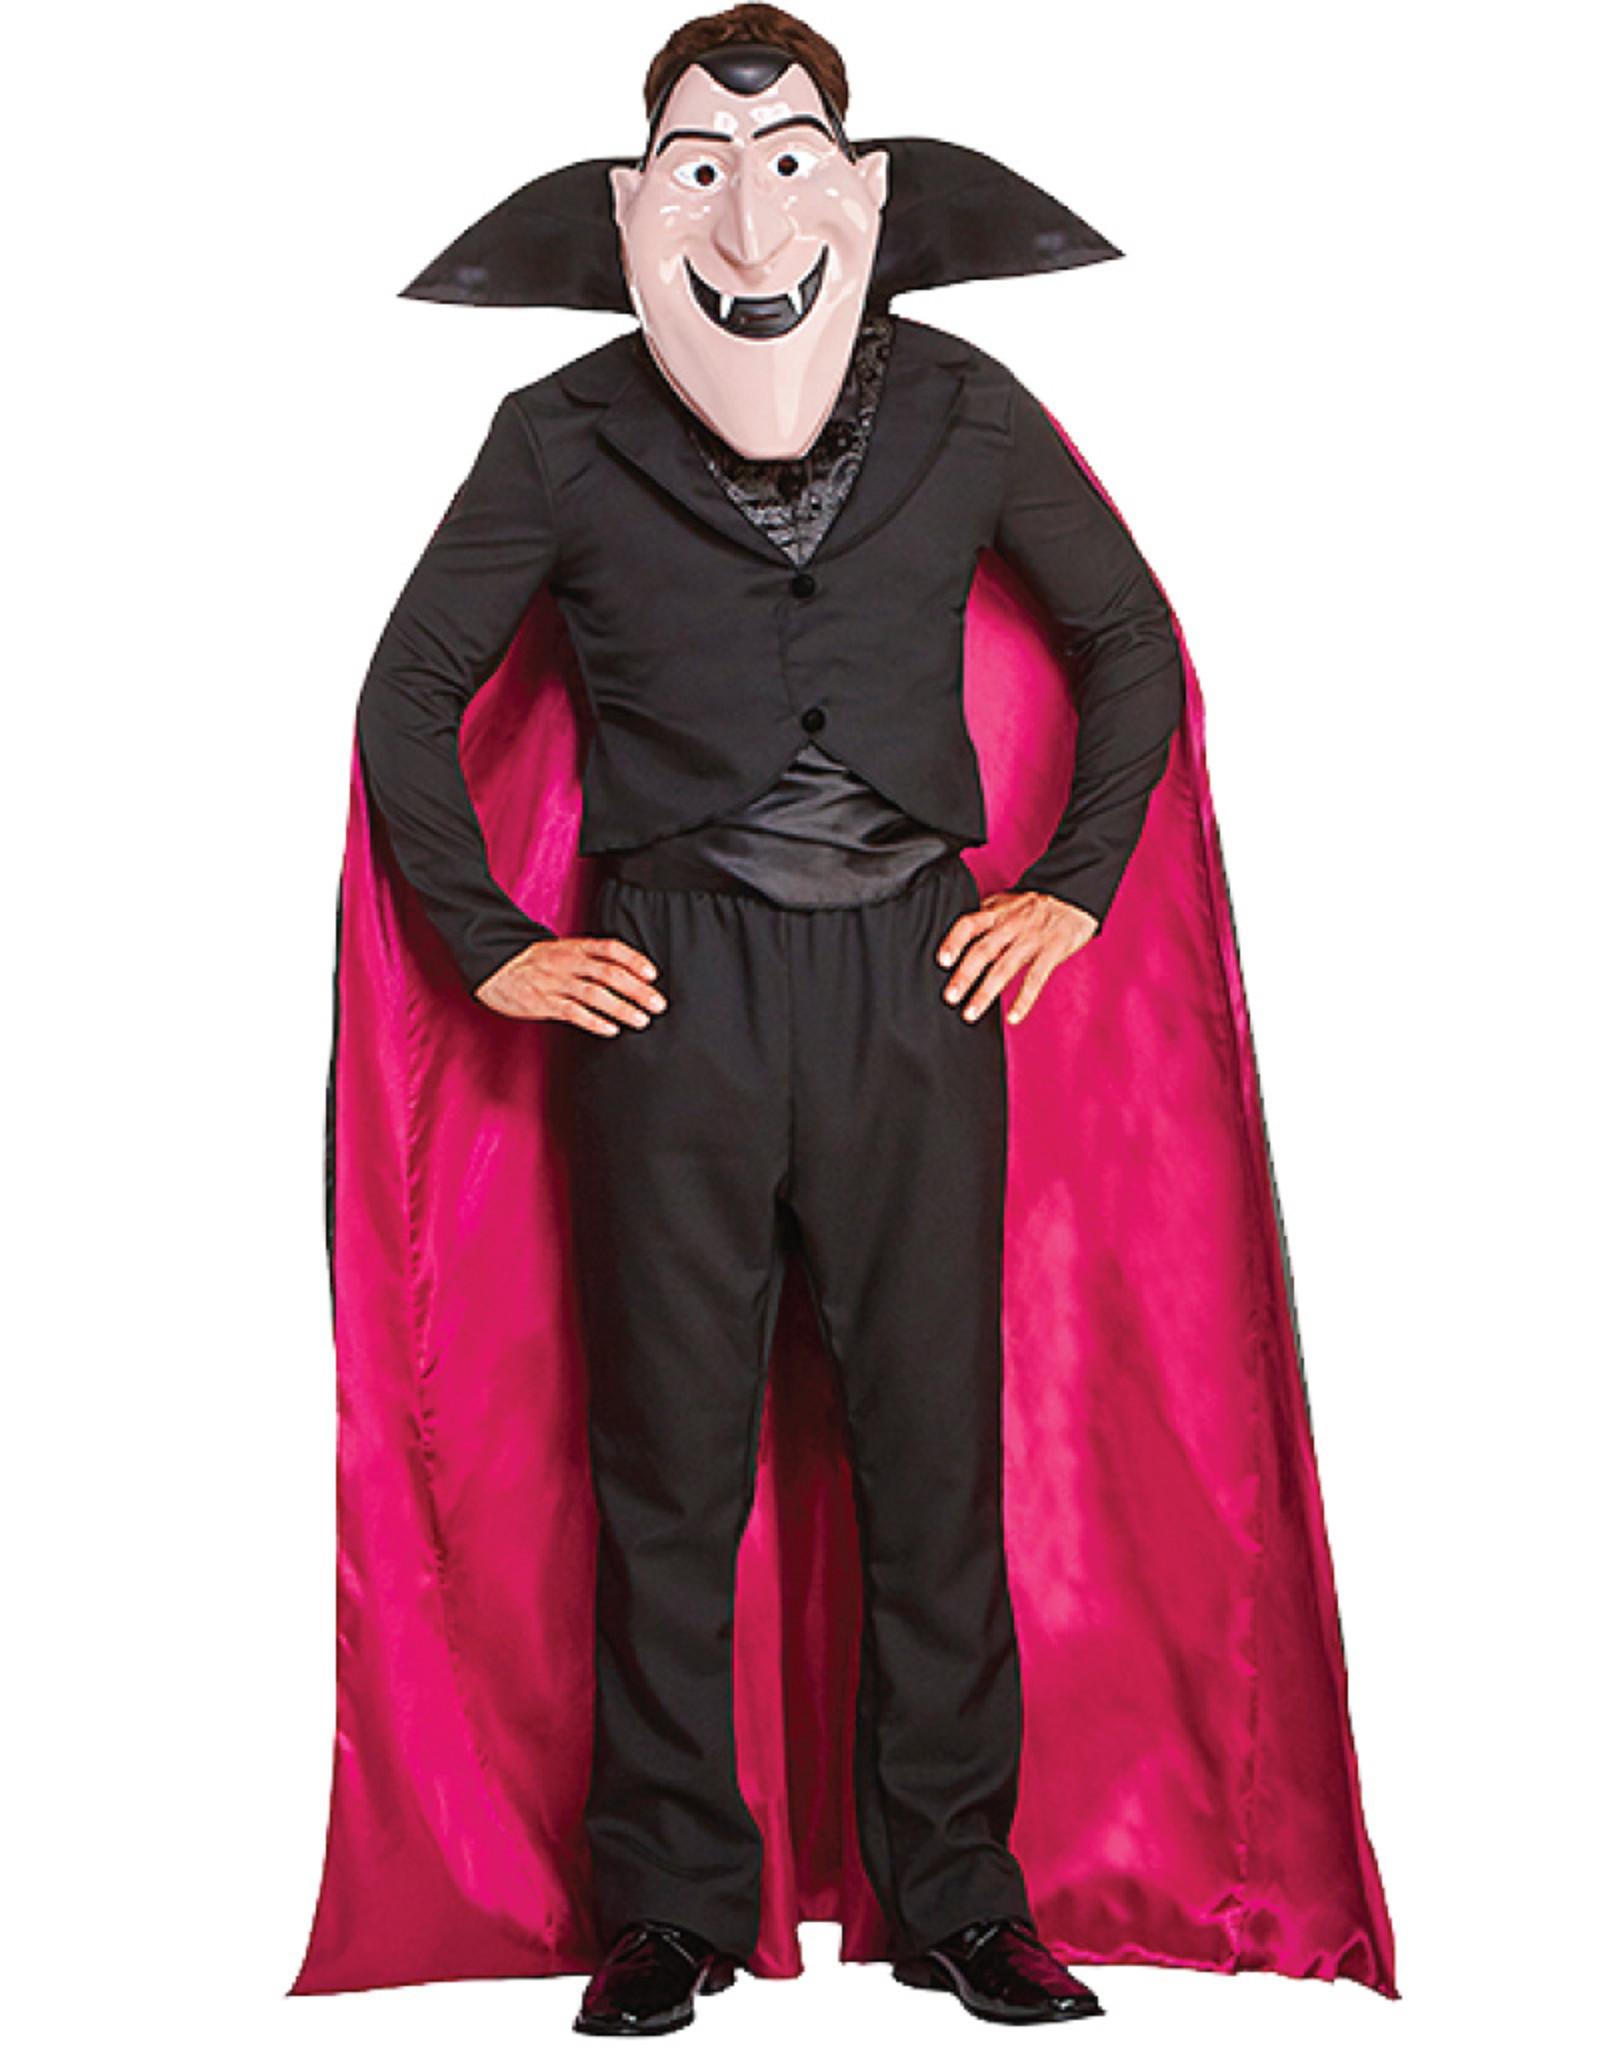 Dracula - Hotel Transylvania Costume - Men's